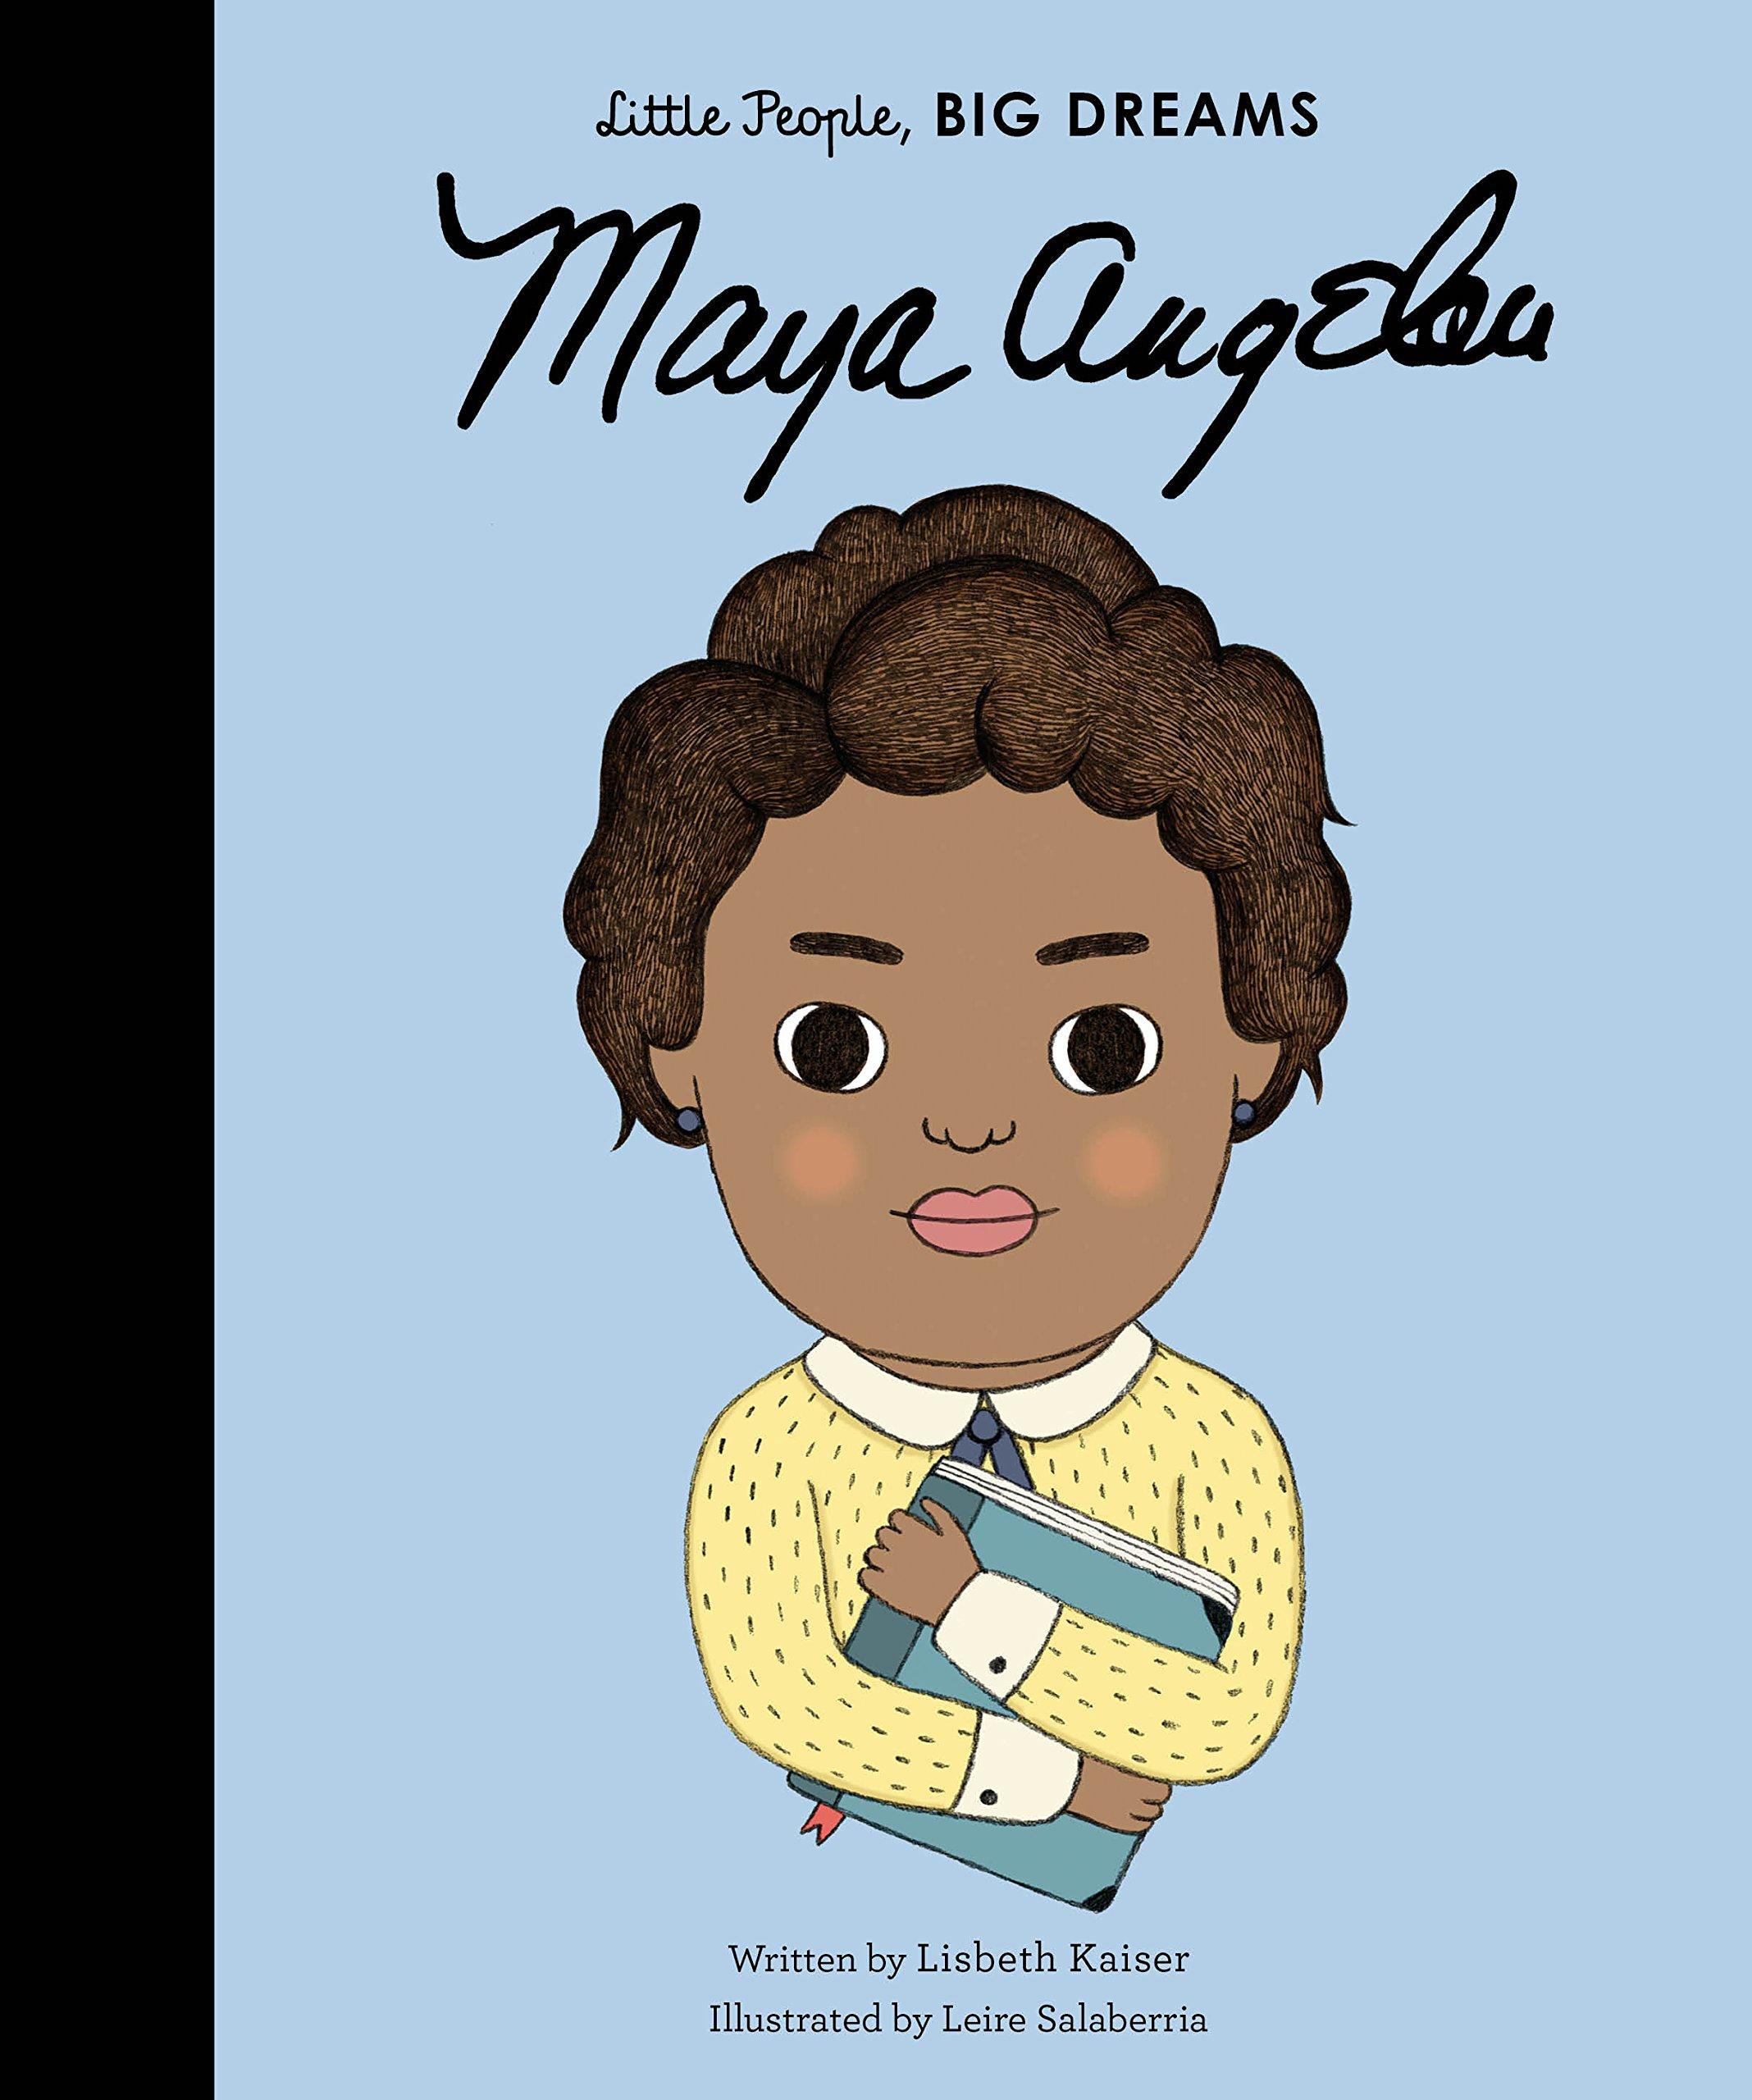 Maya Angelou: 4 (Little People, Big Dreams): Amazon.co.uk: Kaiser, Lisbeth,  Salaberria, Leire: Books